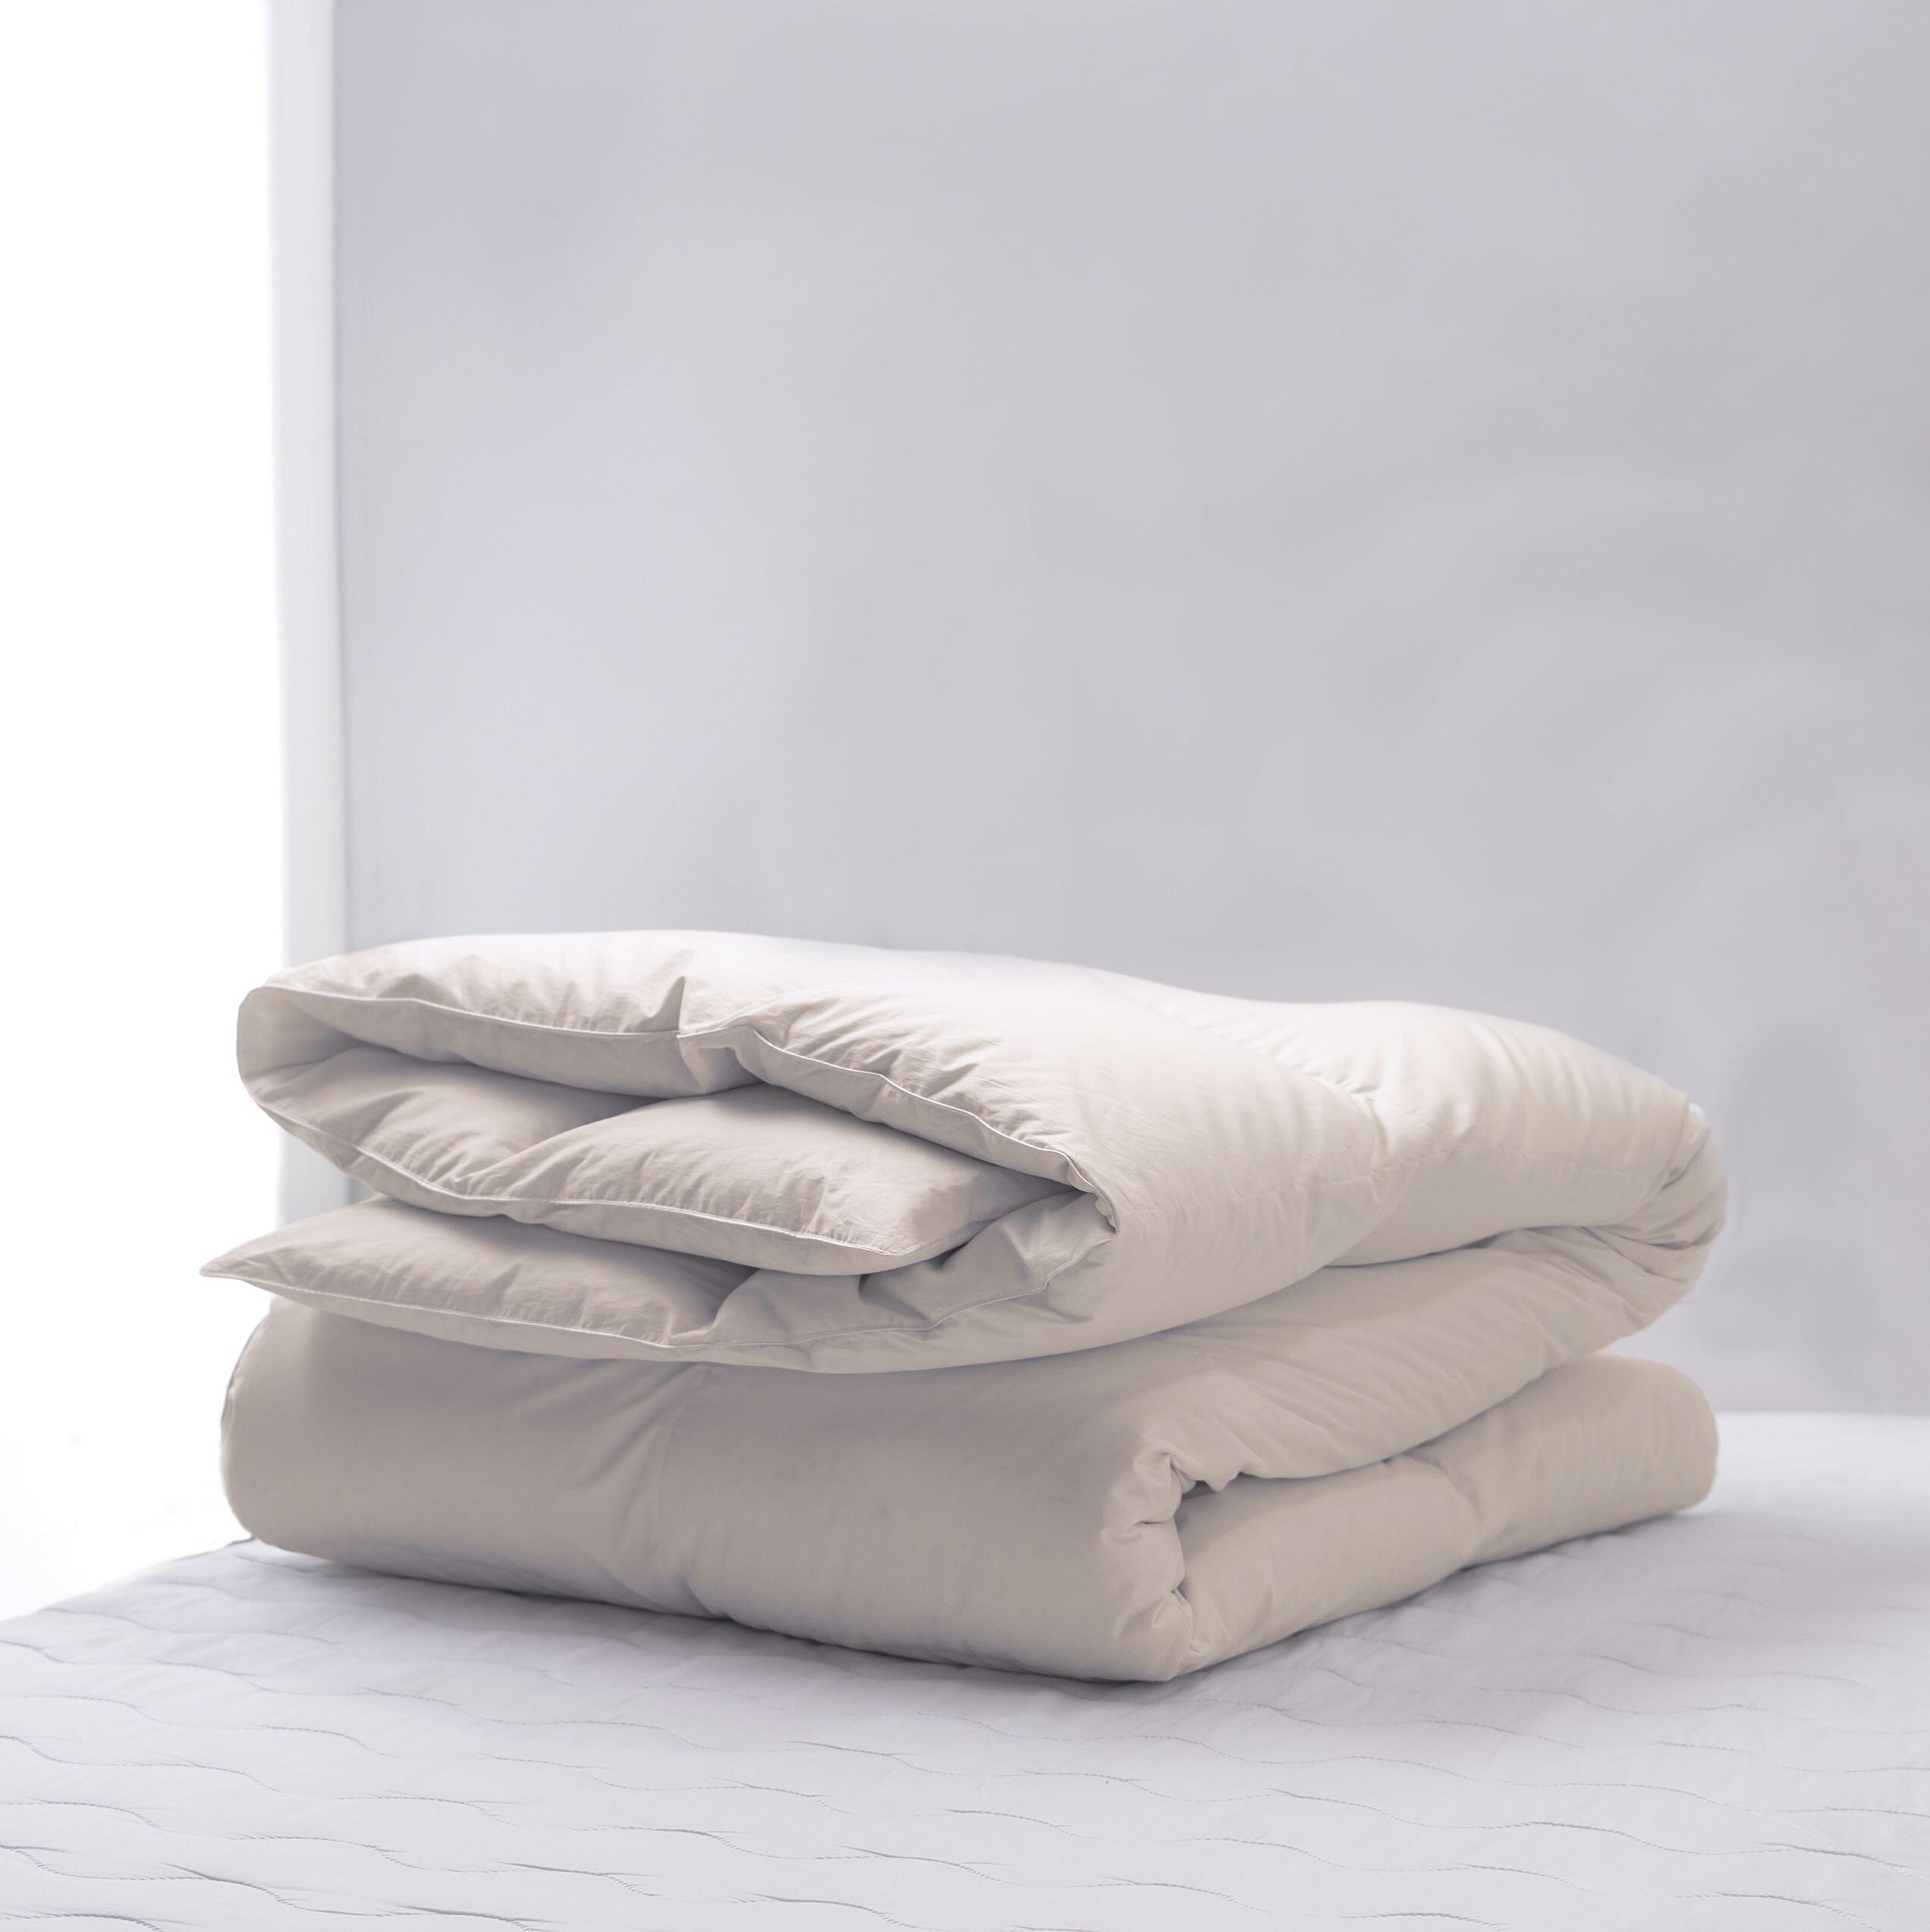 Alwyn Home All Season Polyester Down Alternative Comforter Wayfair